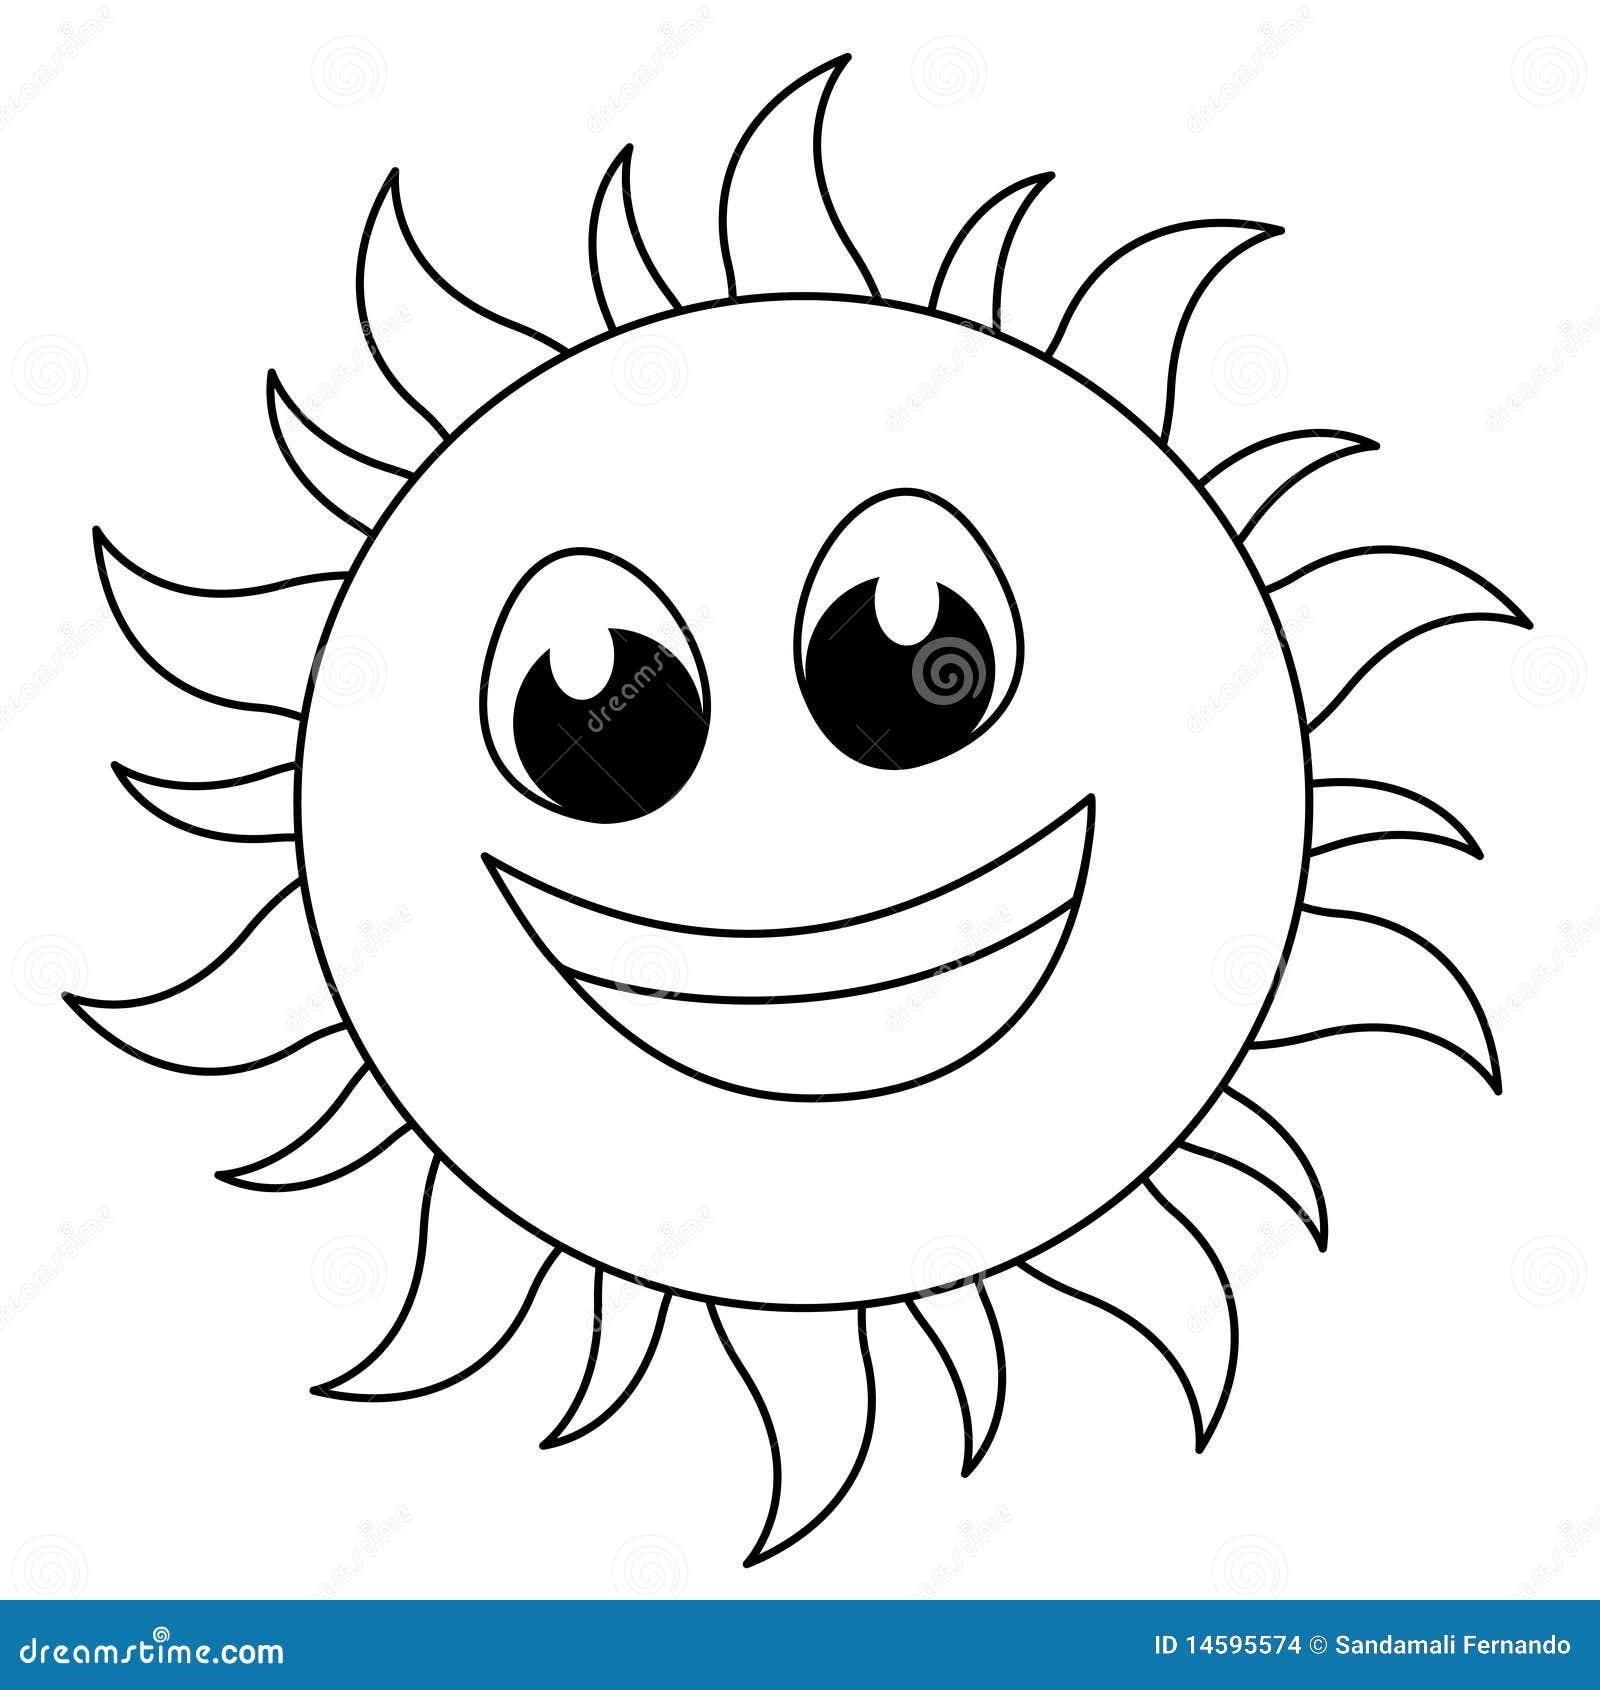 Line Drawing Sun Vector : Sun logo stock vector illustration of drawing black